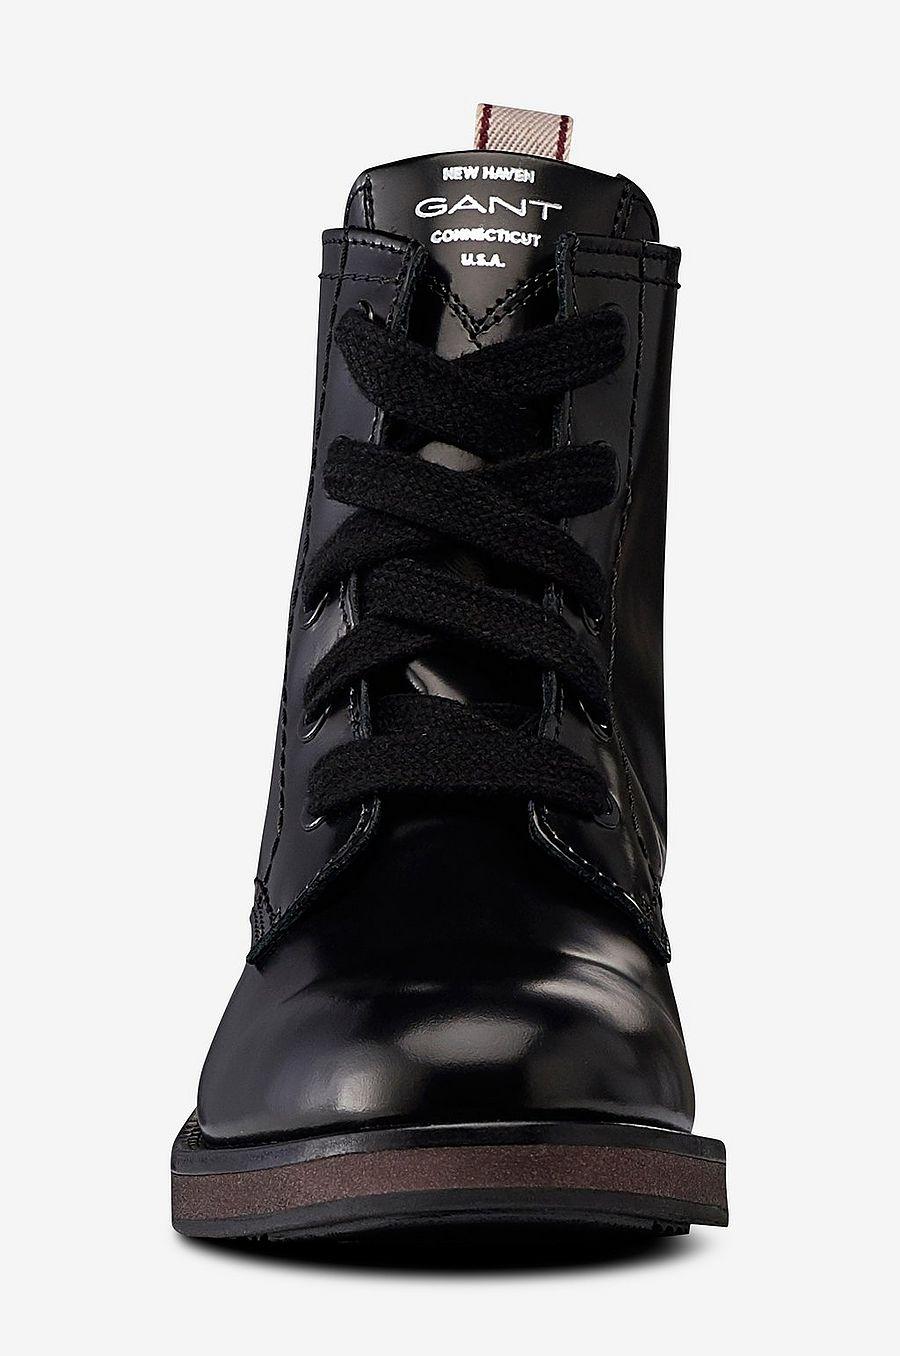 Støvler Støvler no Malin Gant Mid Svart Svart Svart Ellos Lace Boot Dame 4dx8xP6